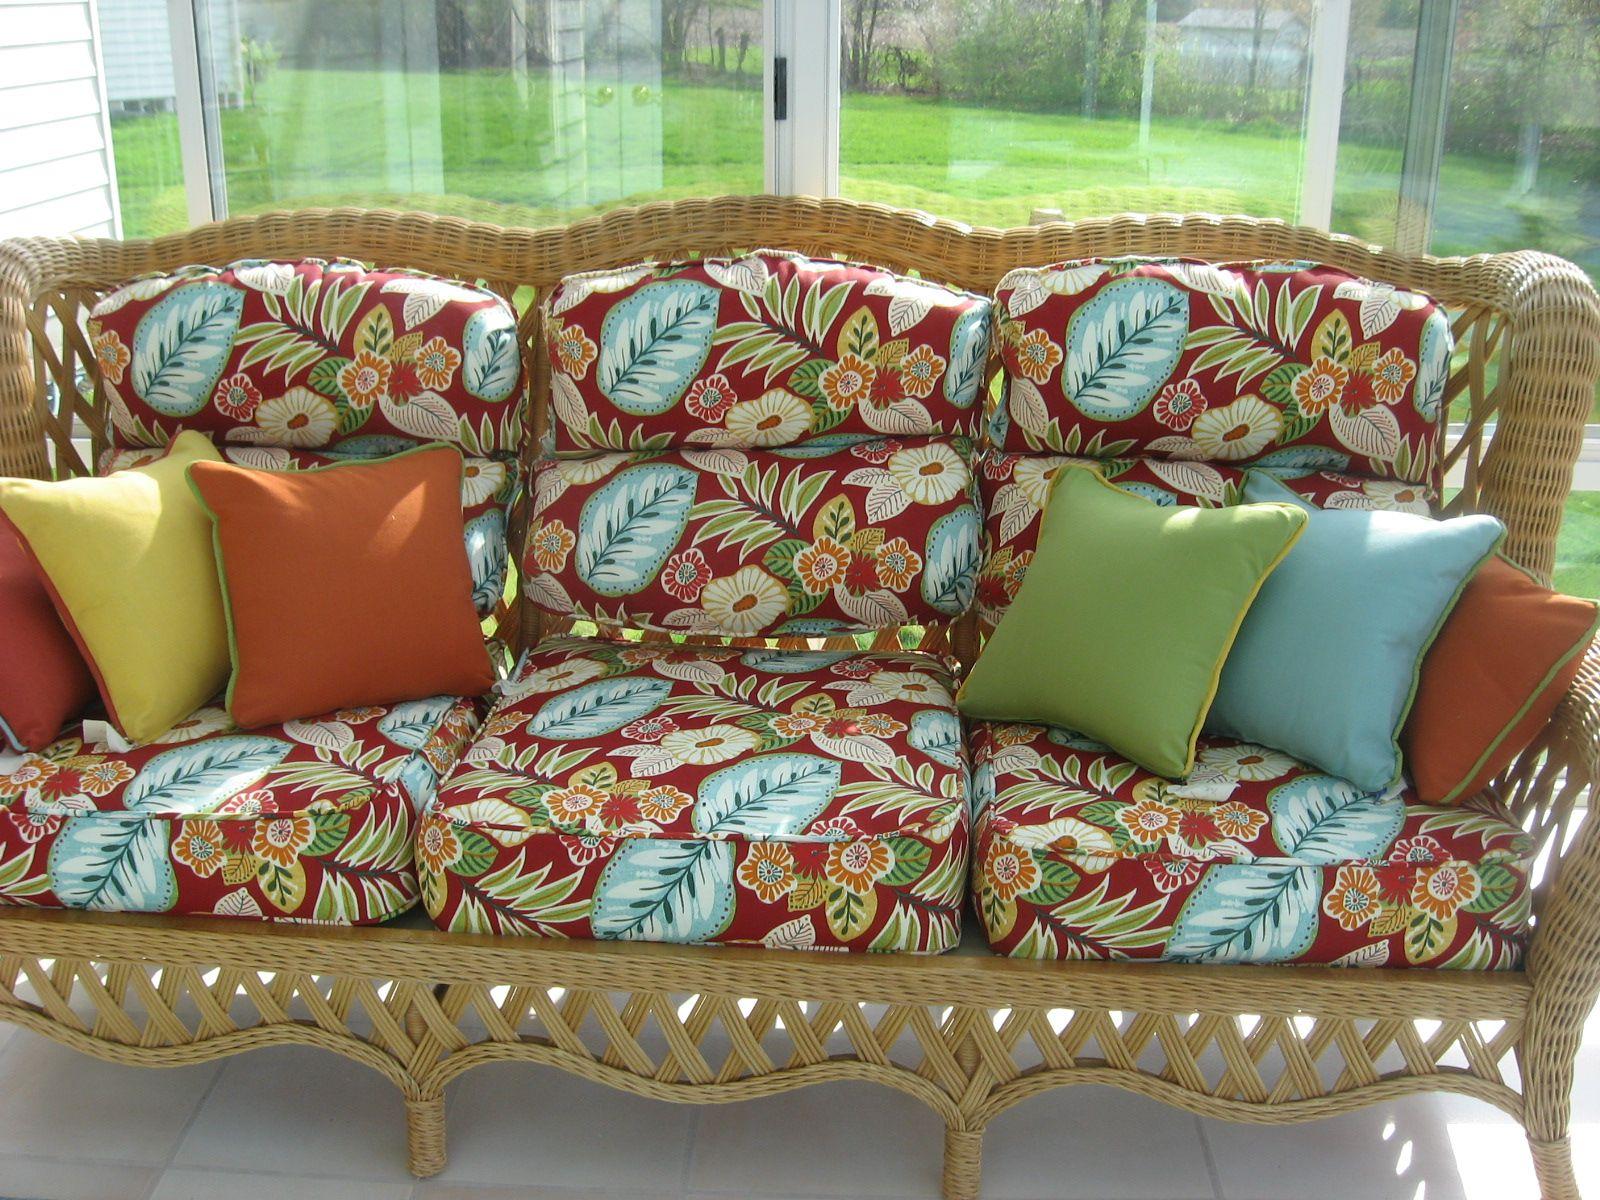 Corded Patio Cushions - Dublin, Ohio